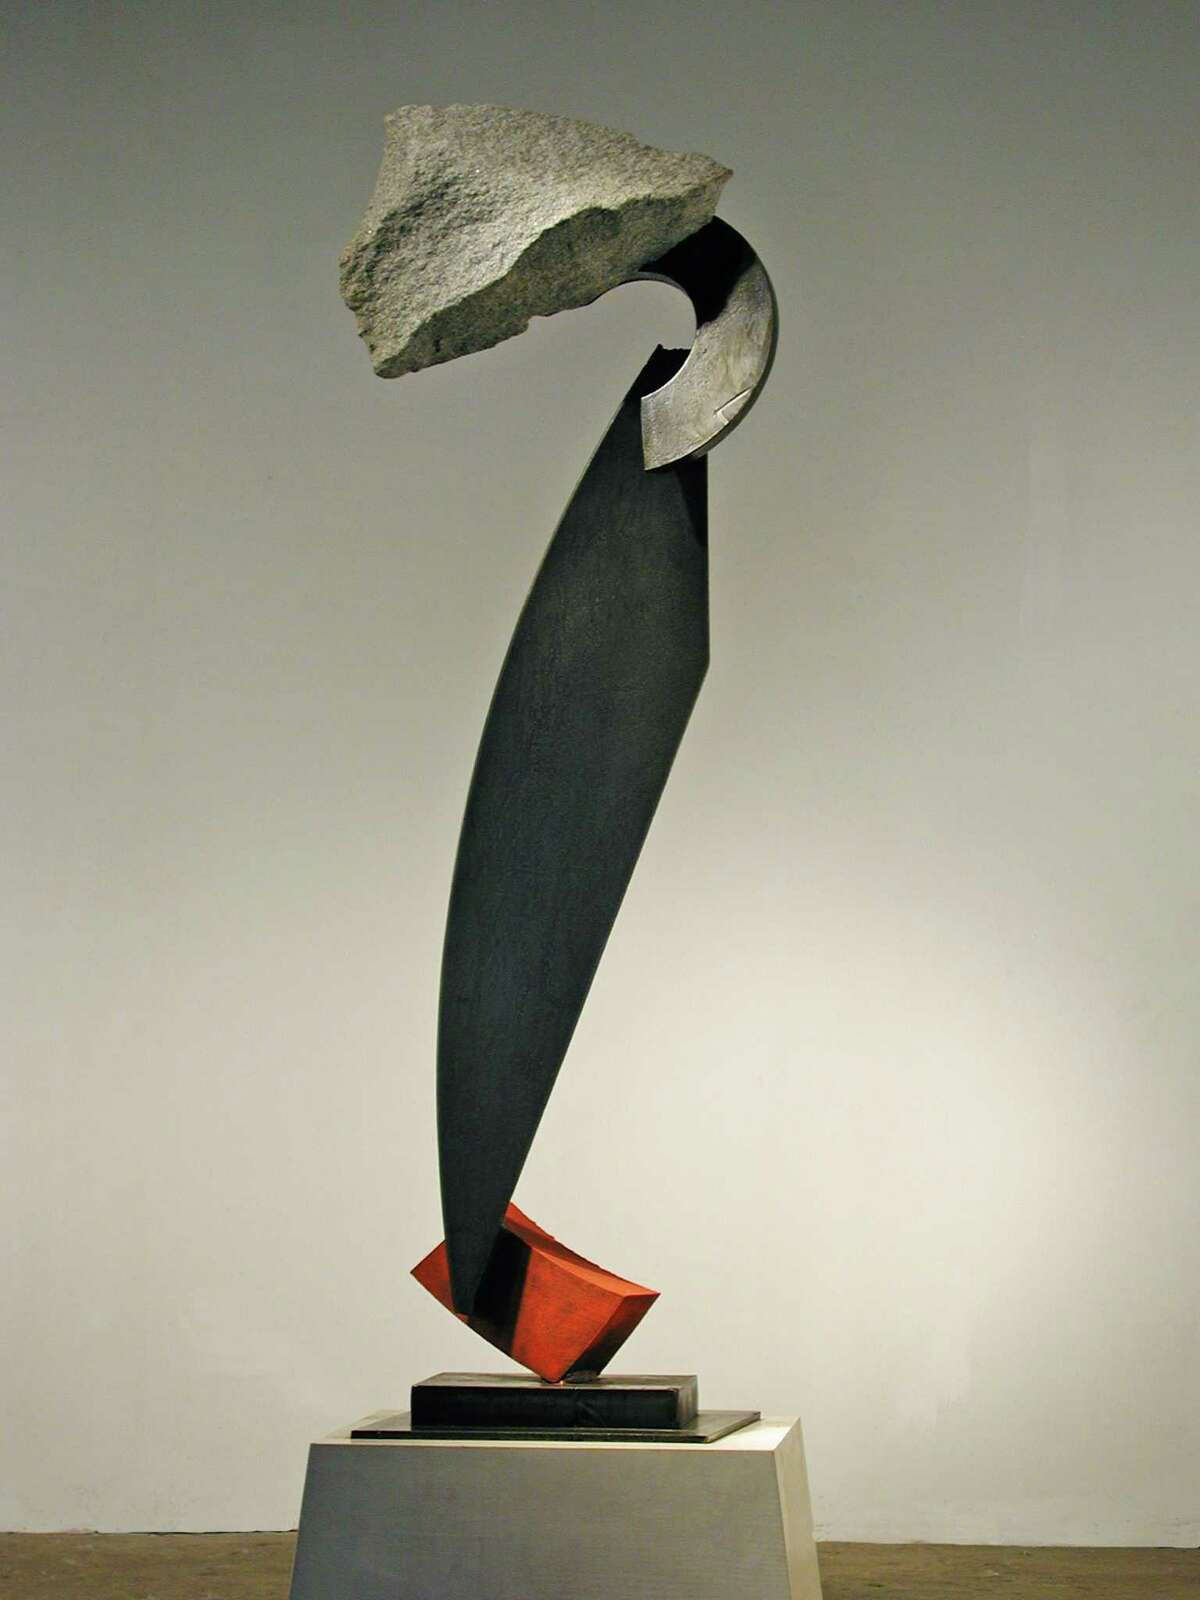 John Van Alstine's Pique, 2002, granite, pigmented and sealed steel, 62